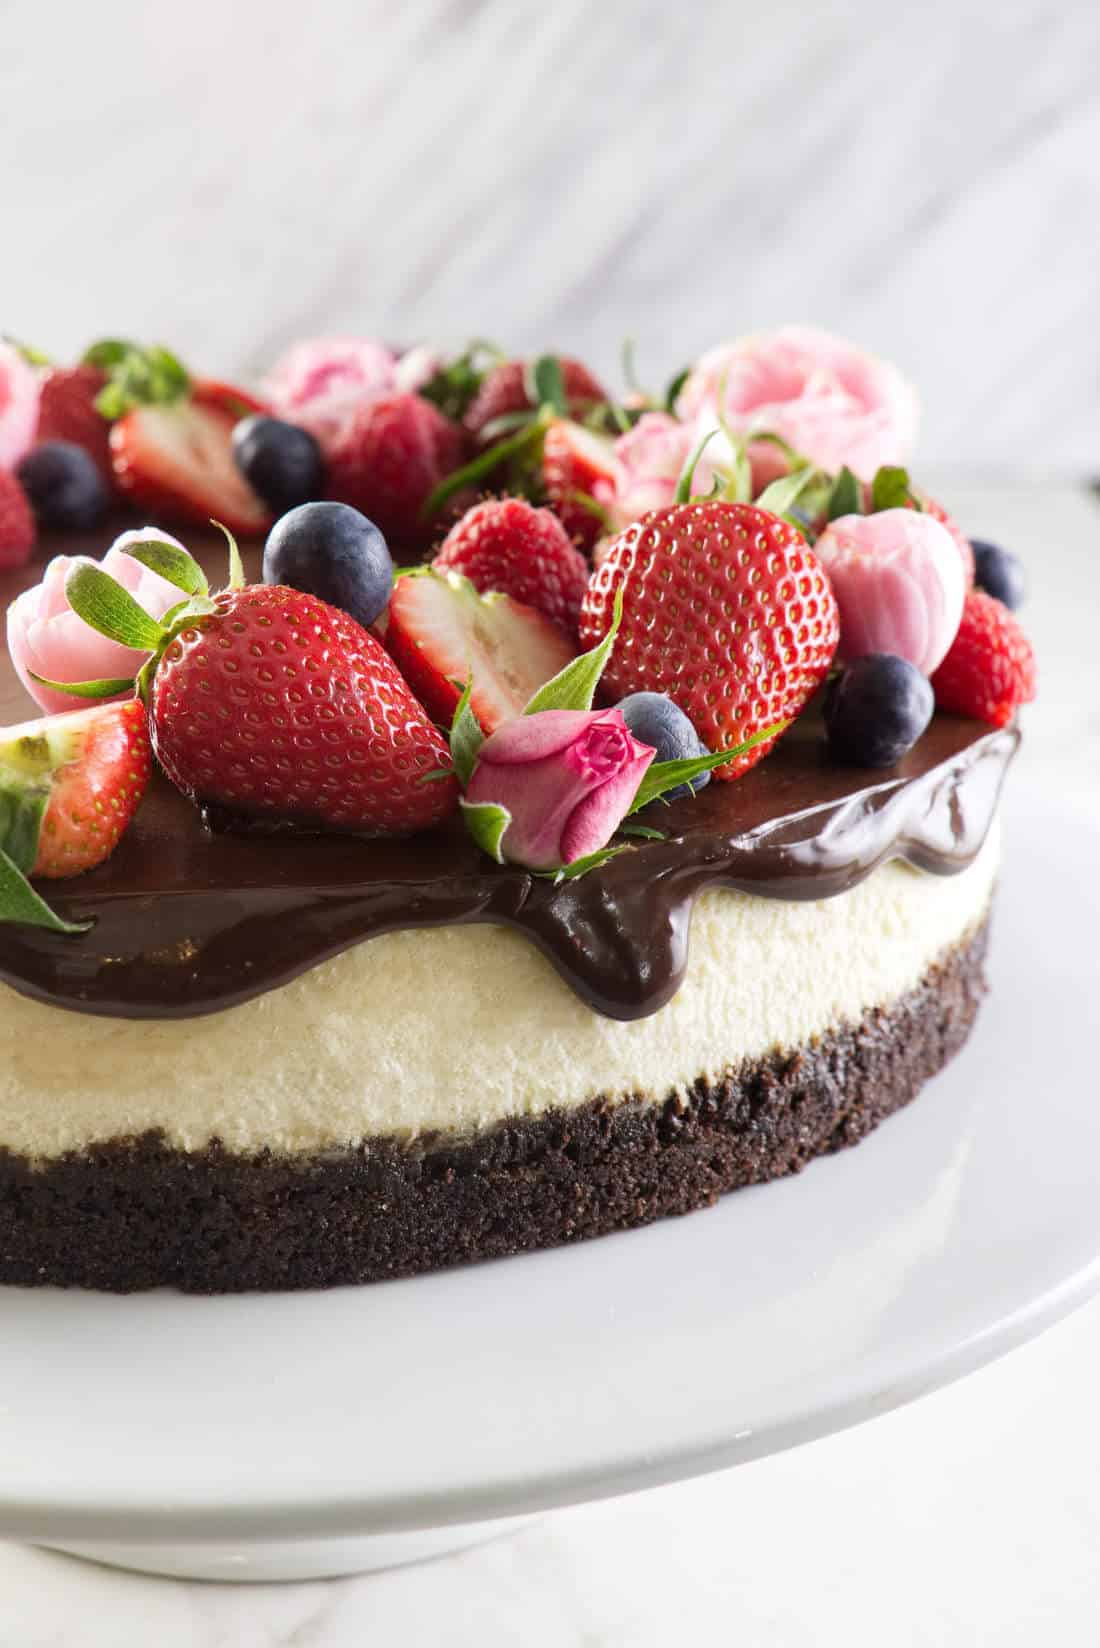 Bourbon Vanilla Cheesecake with Chocolate Ganache from Savor the Best